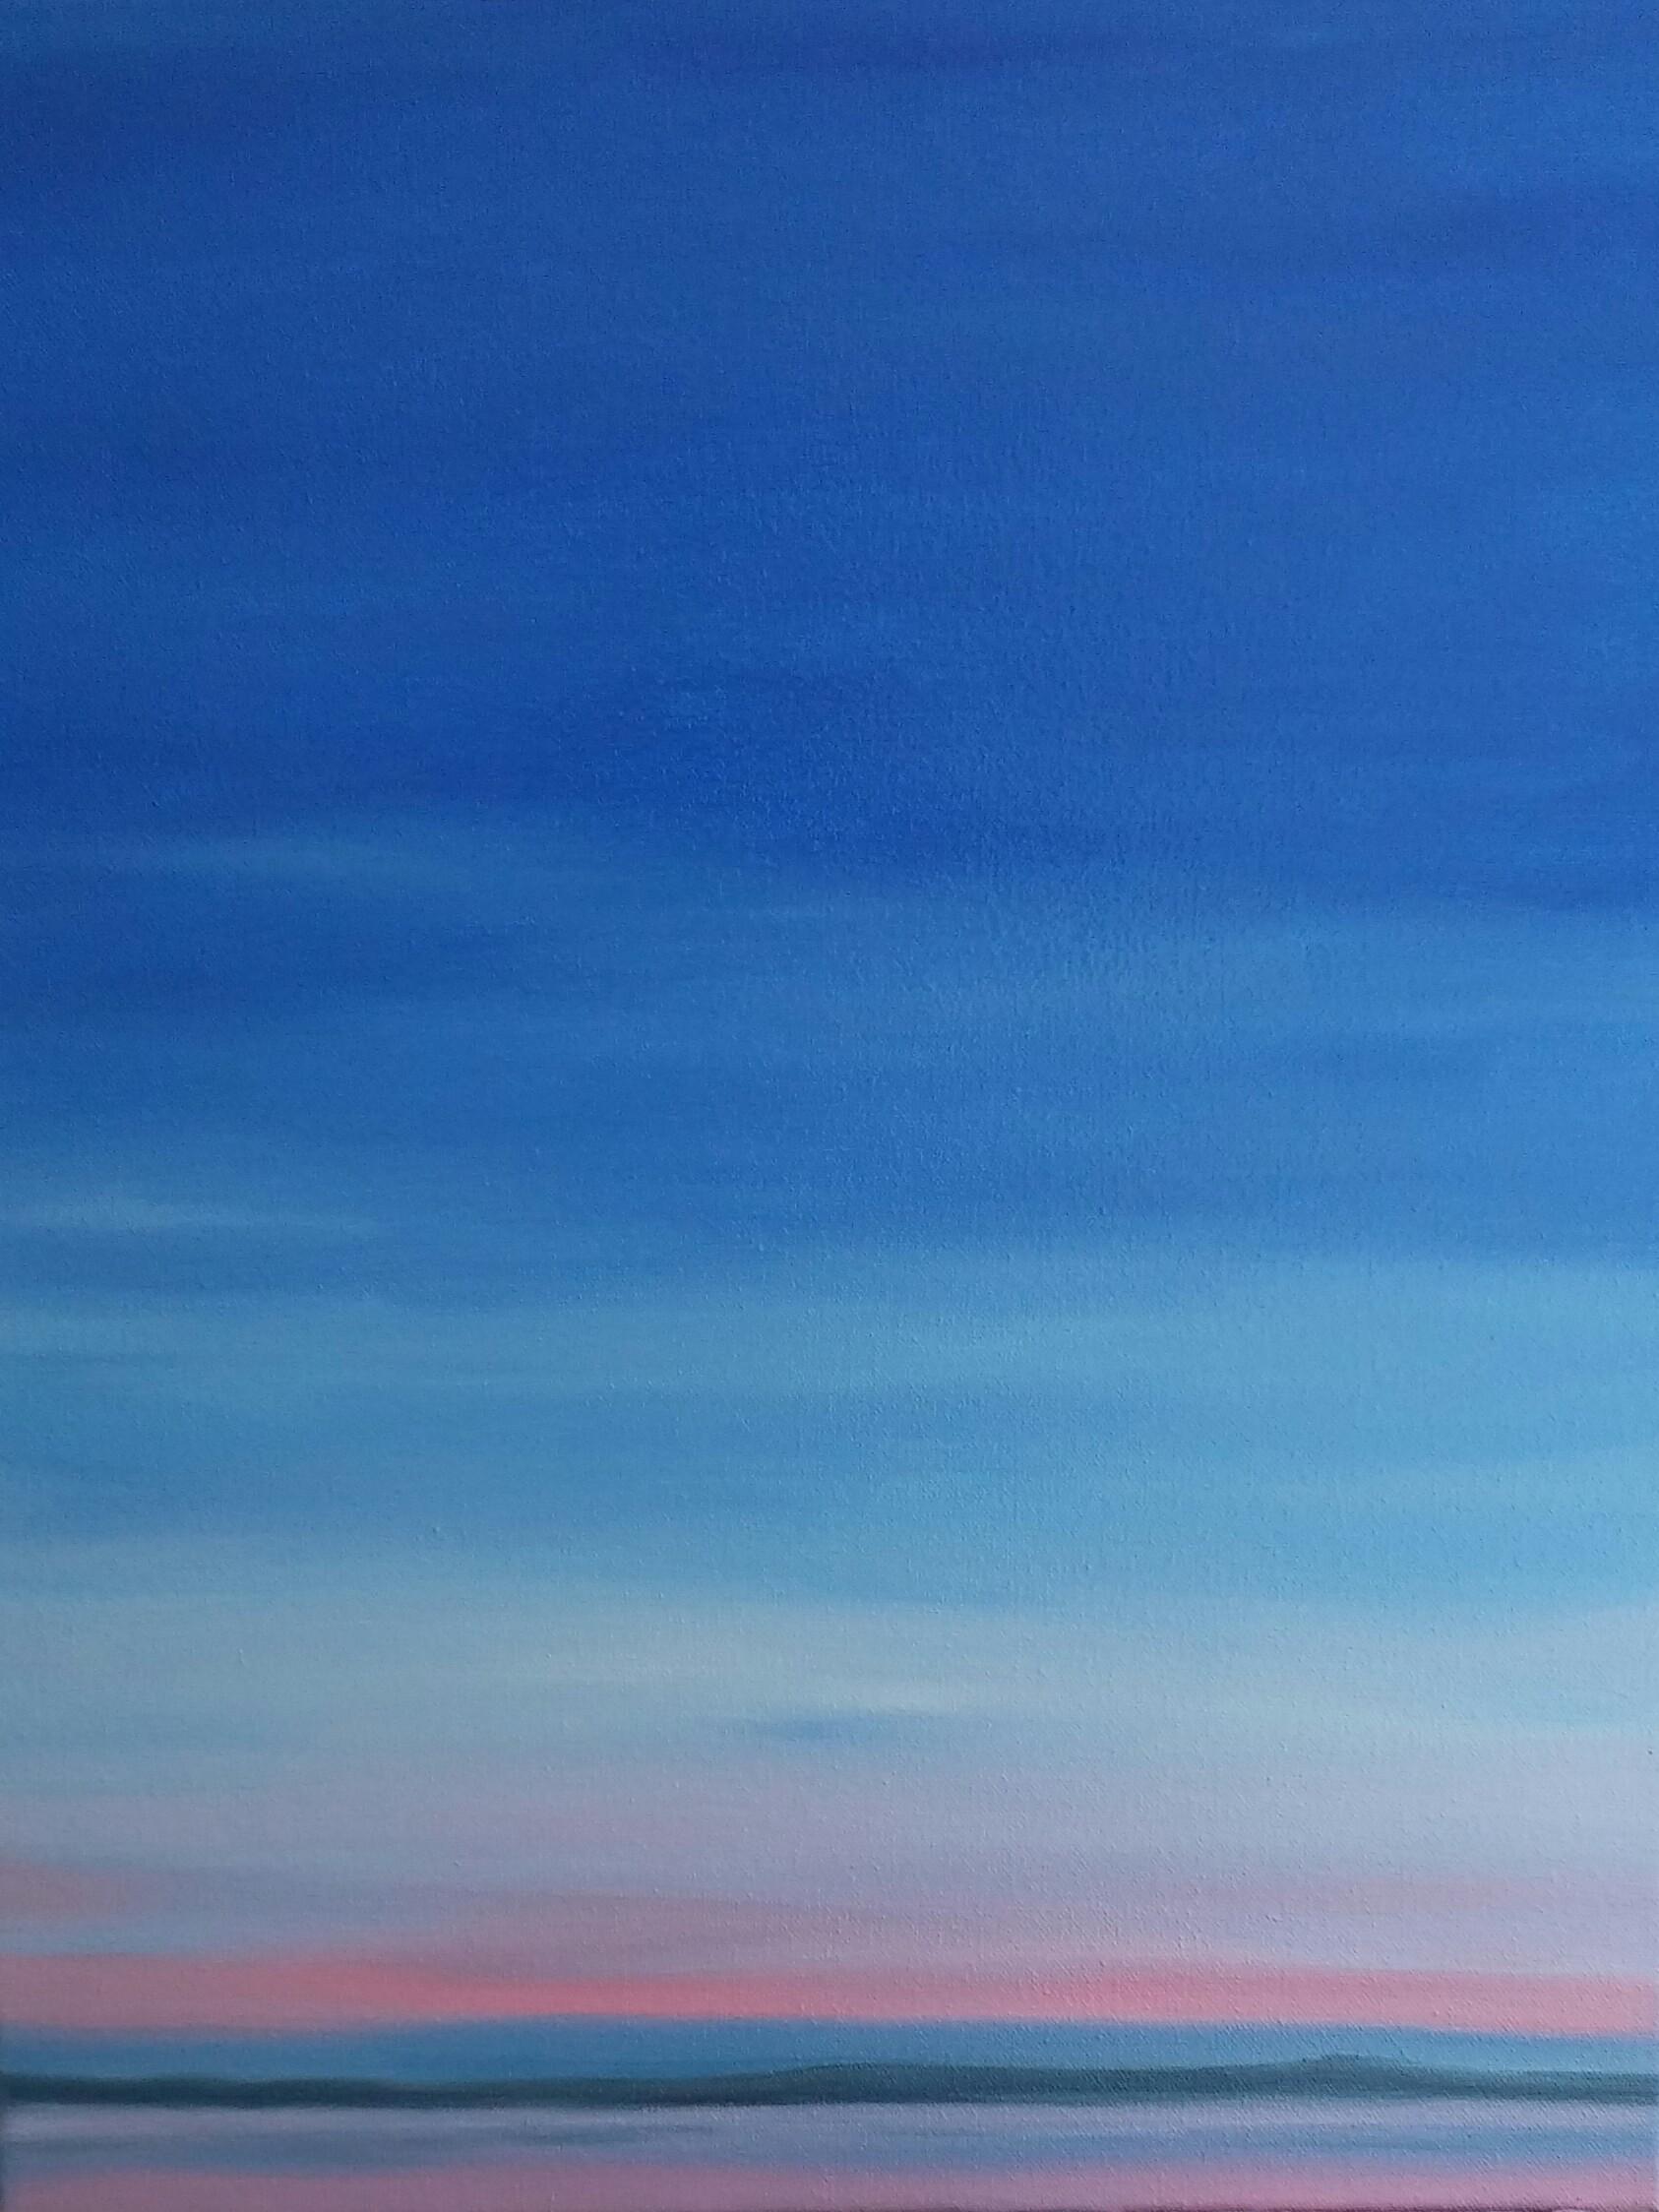 Blue & Pink Sunset